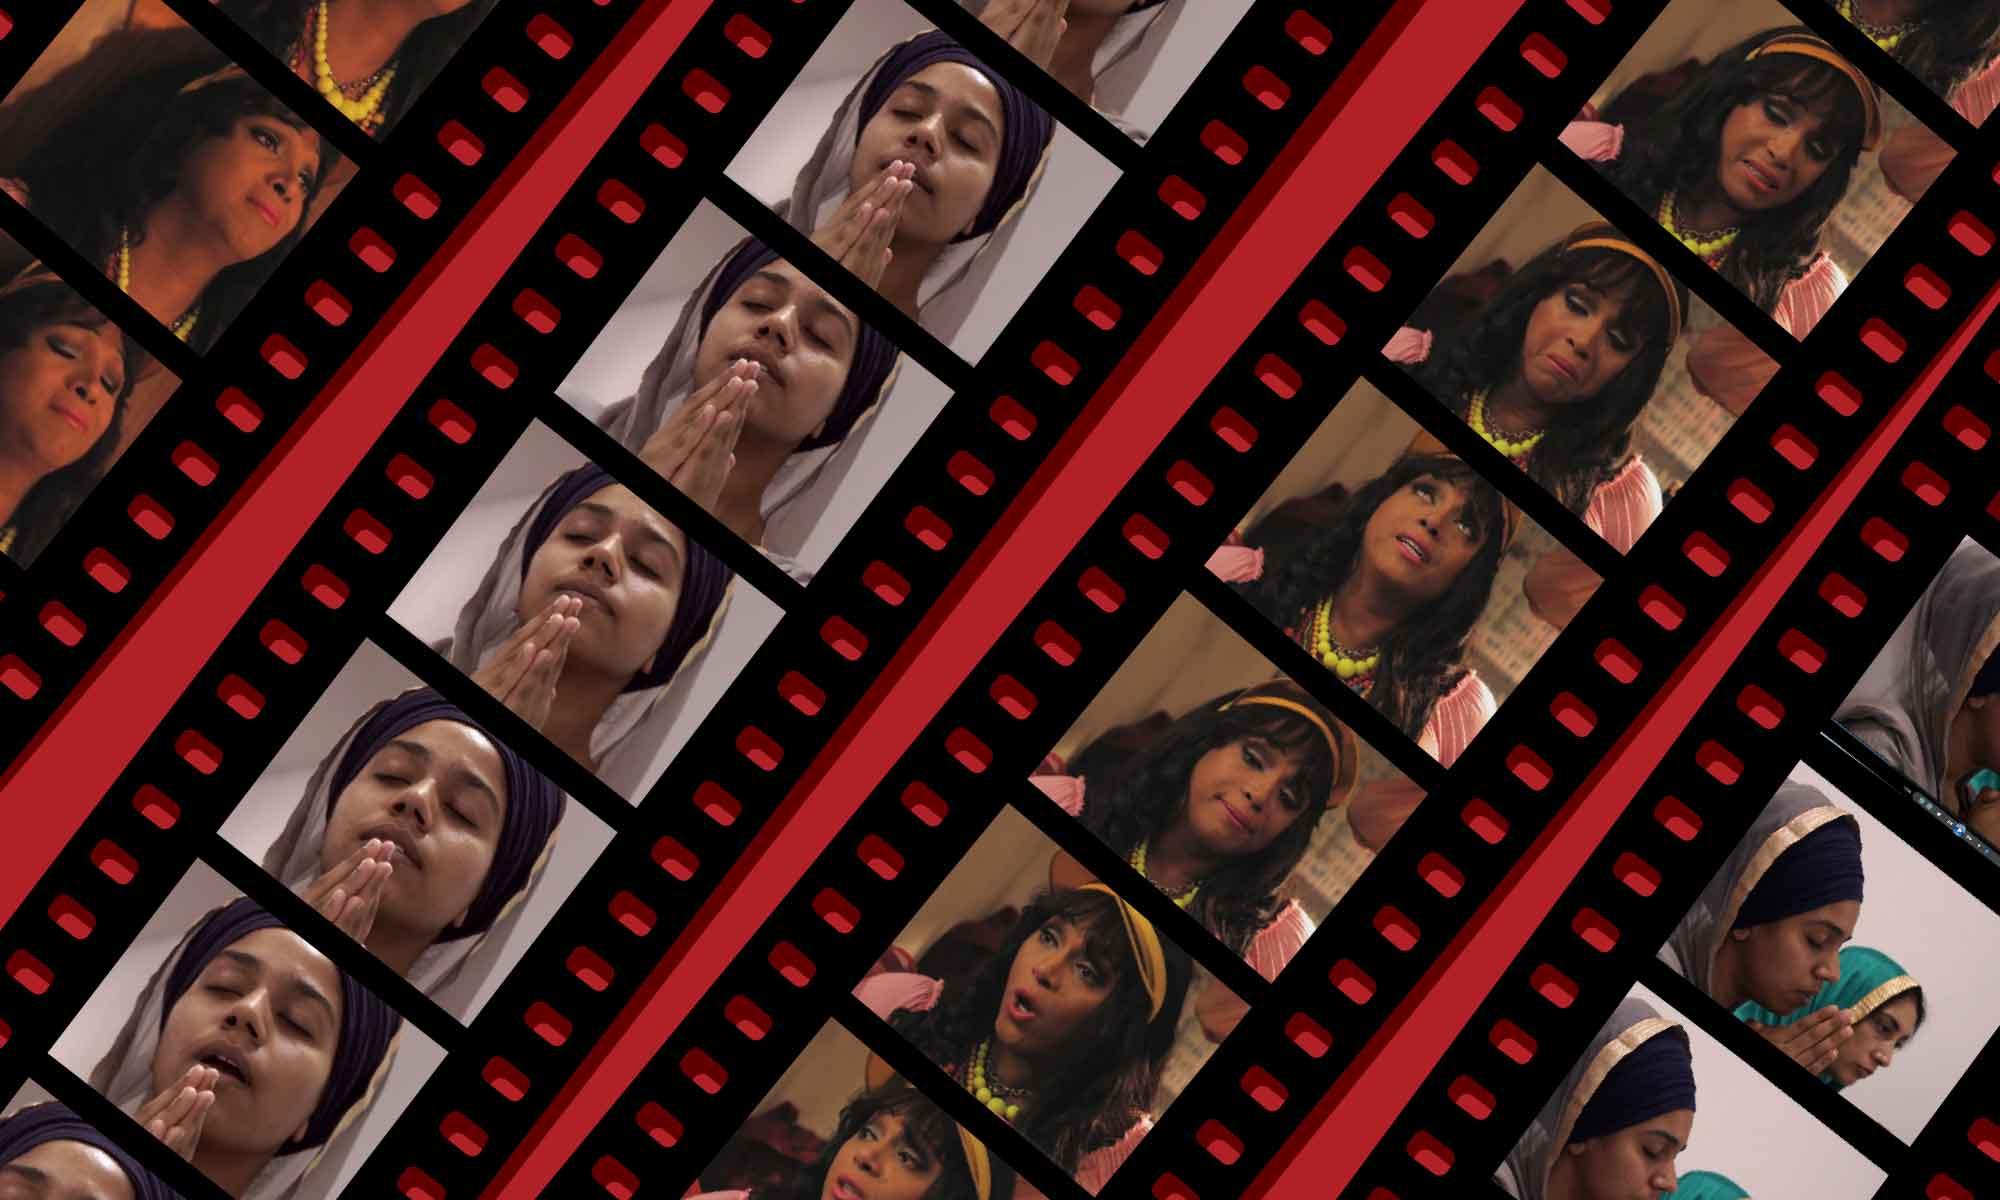 Fotogrammi delle protagoniste di due audiovisivi prodotti da Fargo Entertainment: Navampreet Kaur (da 'Codici d'amore') e Juana Jimenez (da 'Trans').